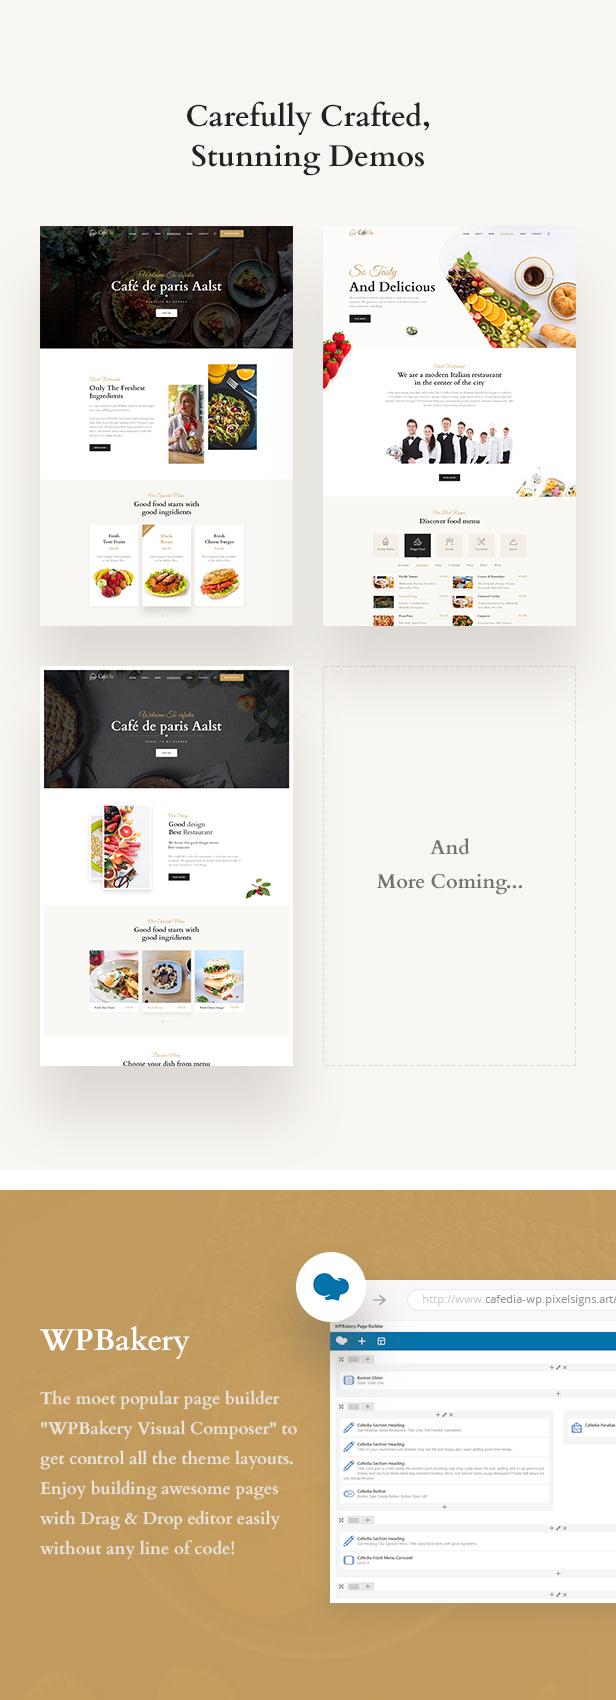 CafeDia - Restaurant WordPress Theme - 3